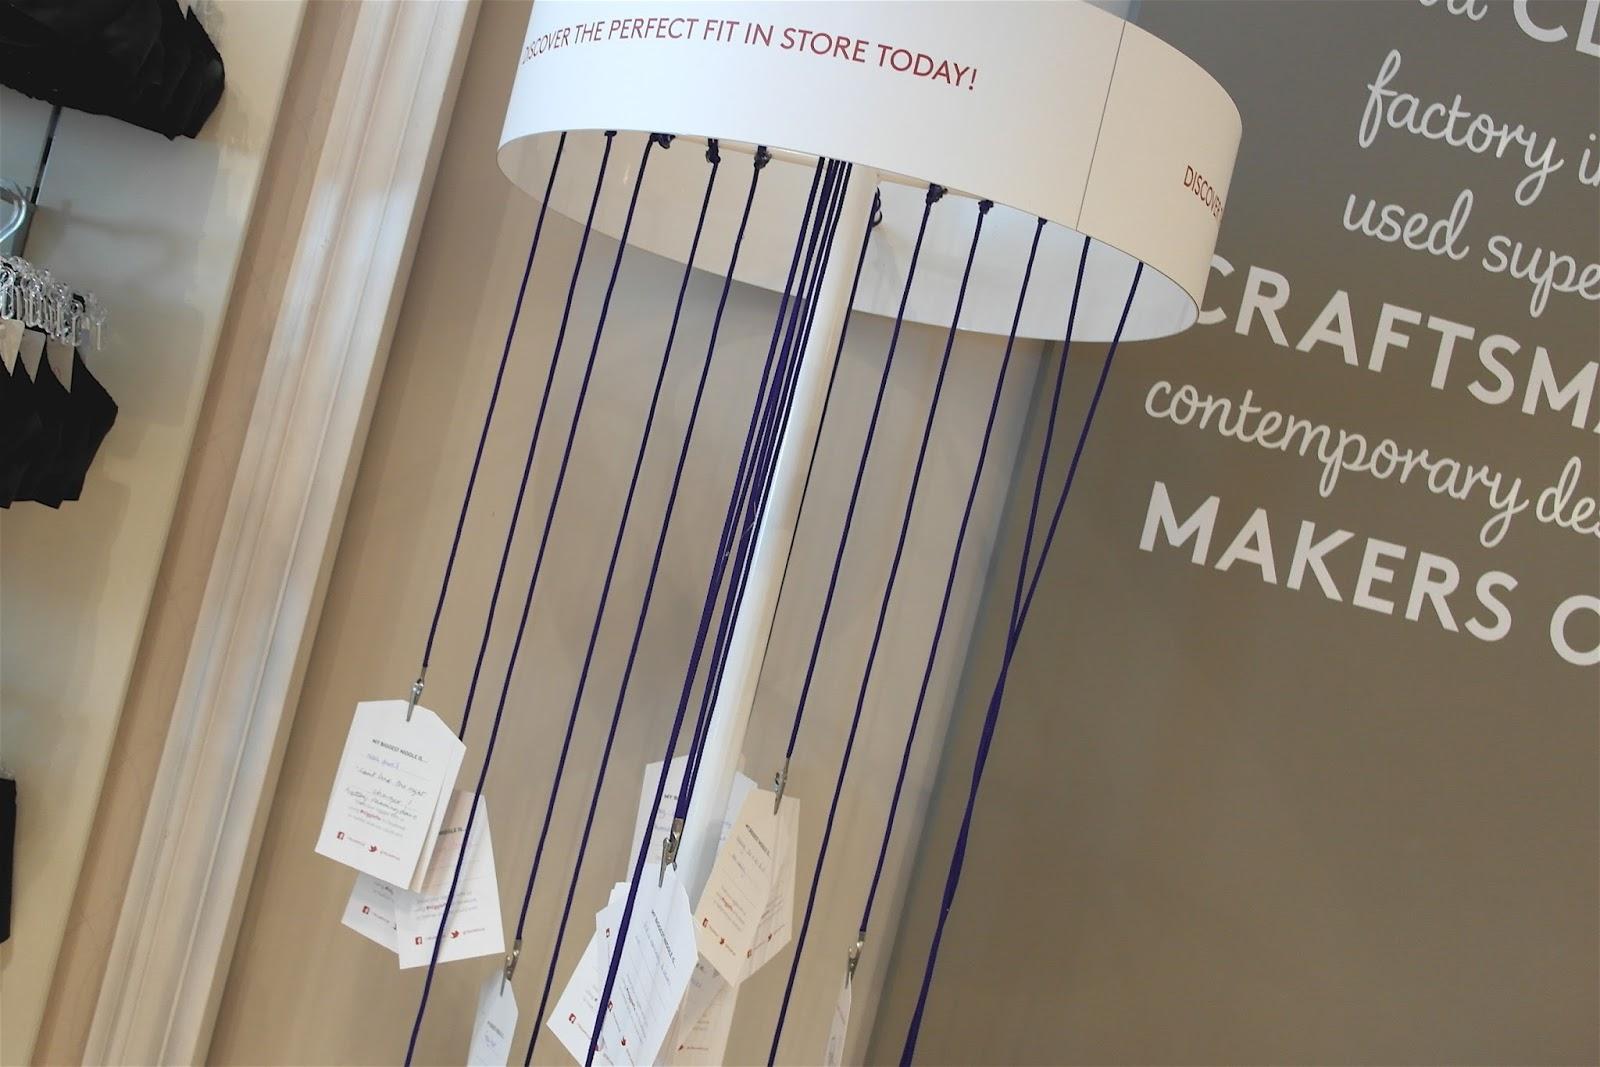 zoe georgina triumph magic wire bra review nigglefix campaign. Black Bedroom Furniture Sets. Home Design Ideas